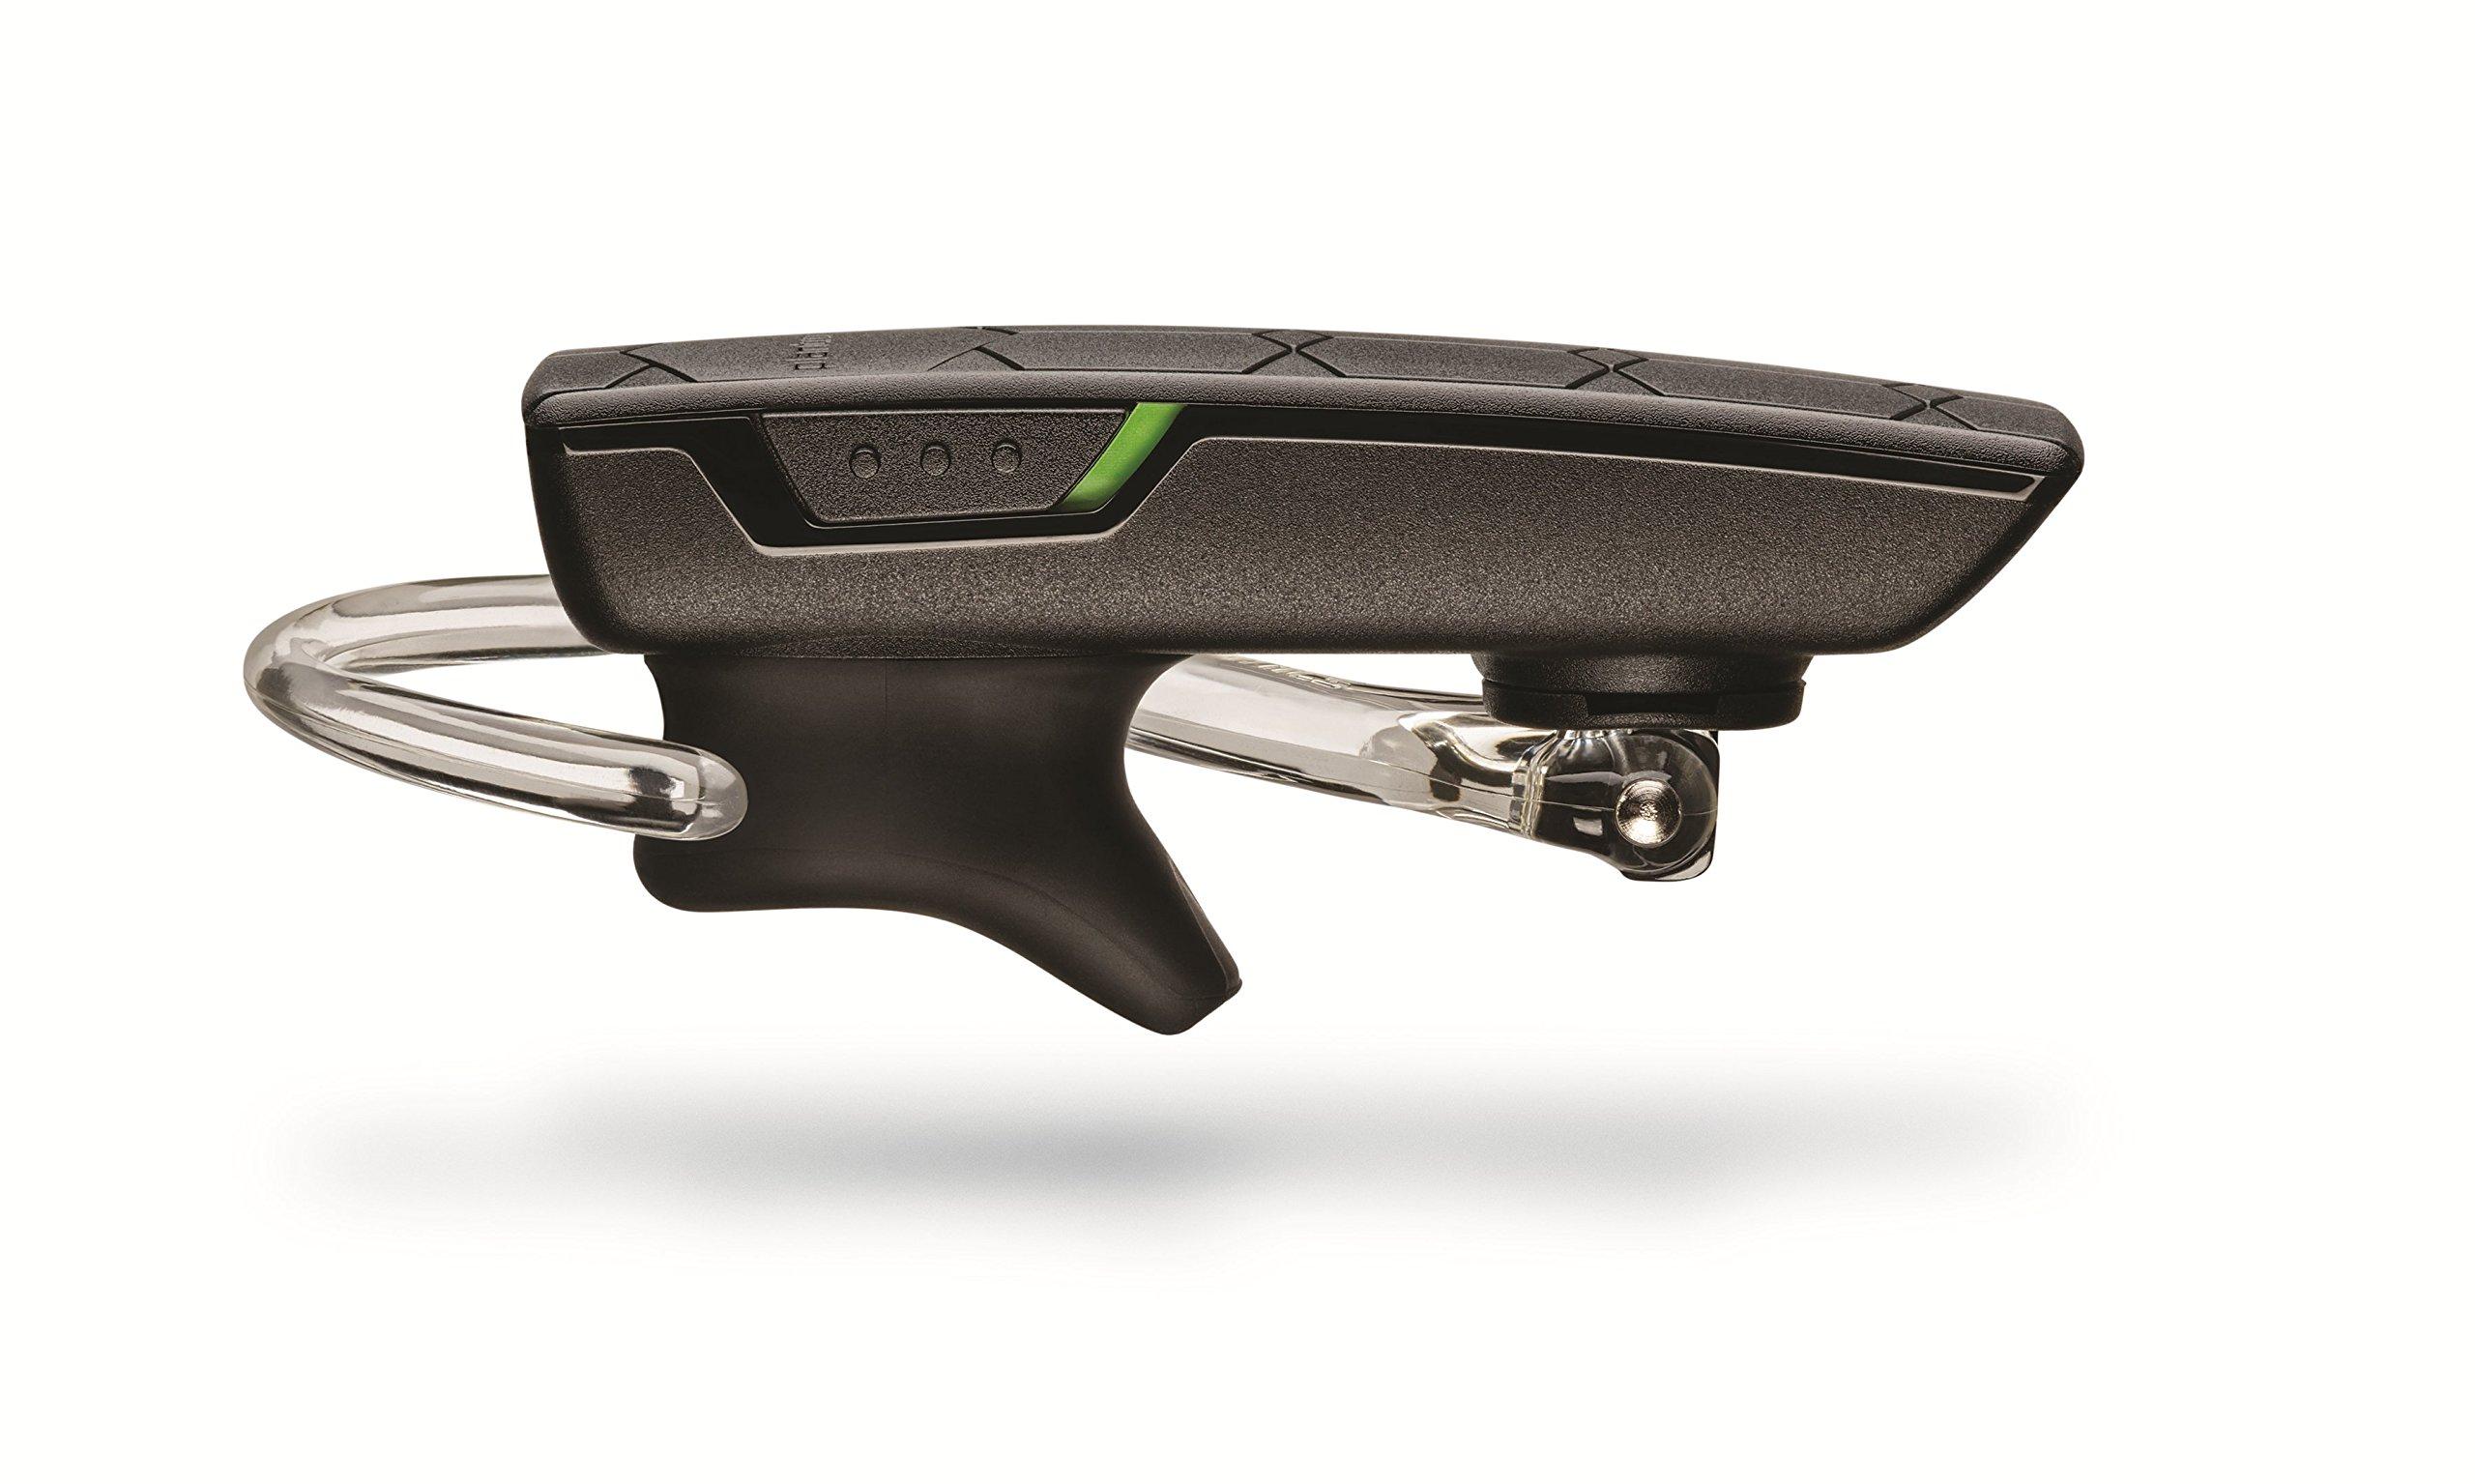 Plantronics Explorer 50 Bluetooth Headset - Retail Packaging - Black by Plantronics (Image #2)